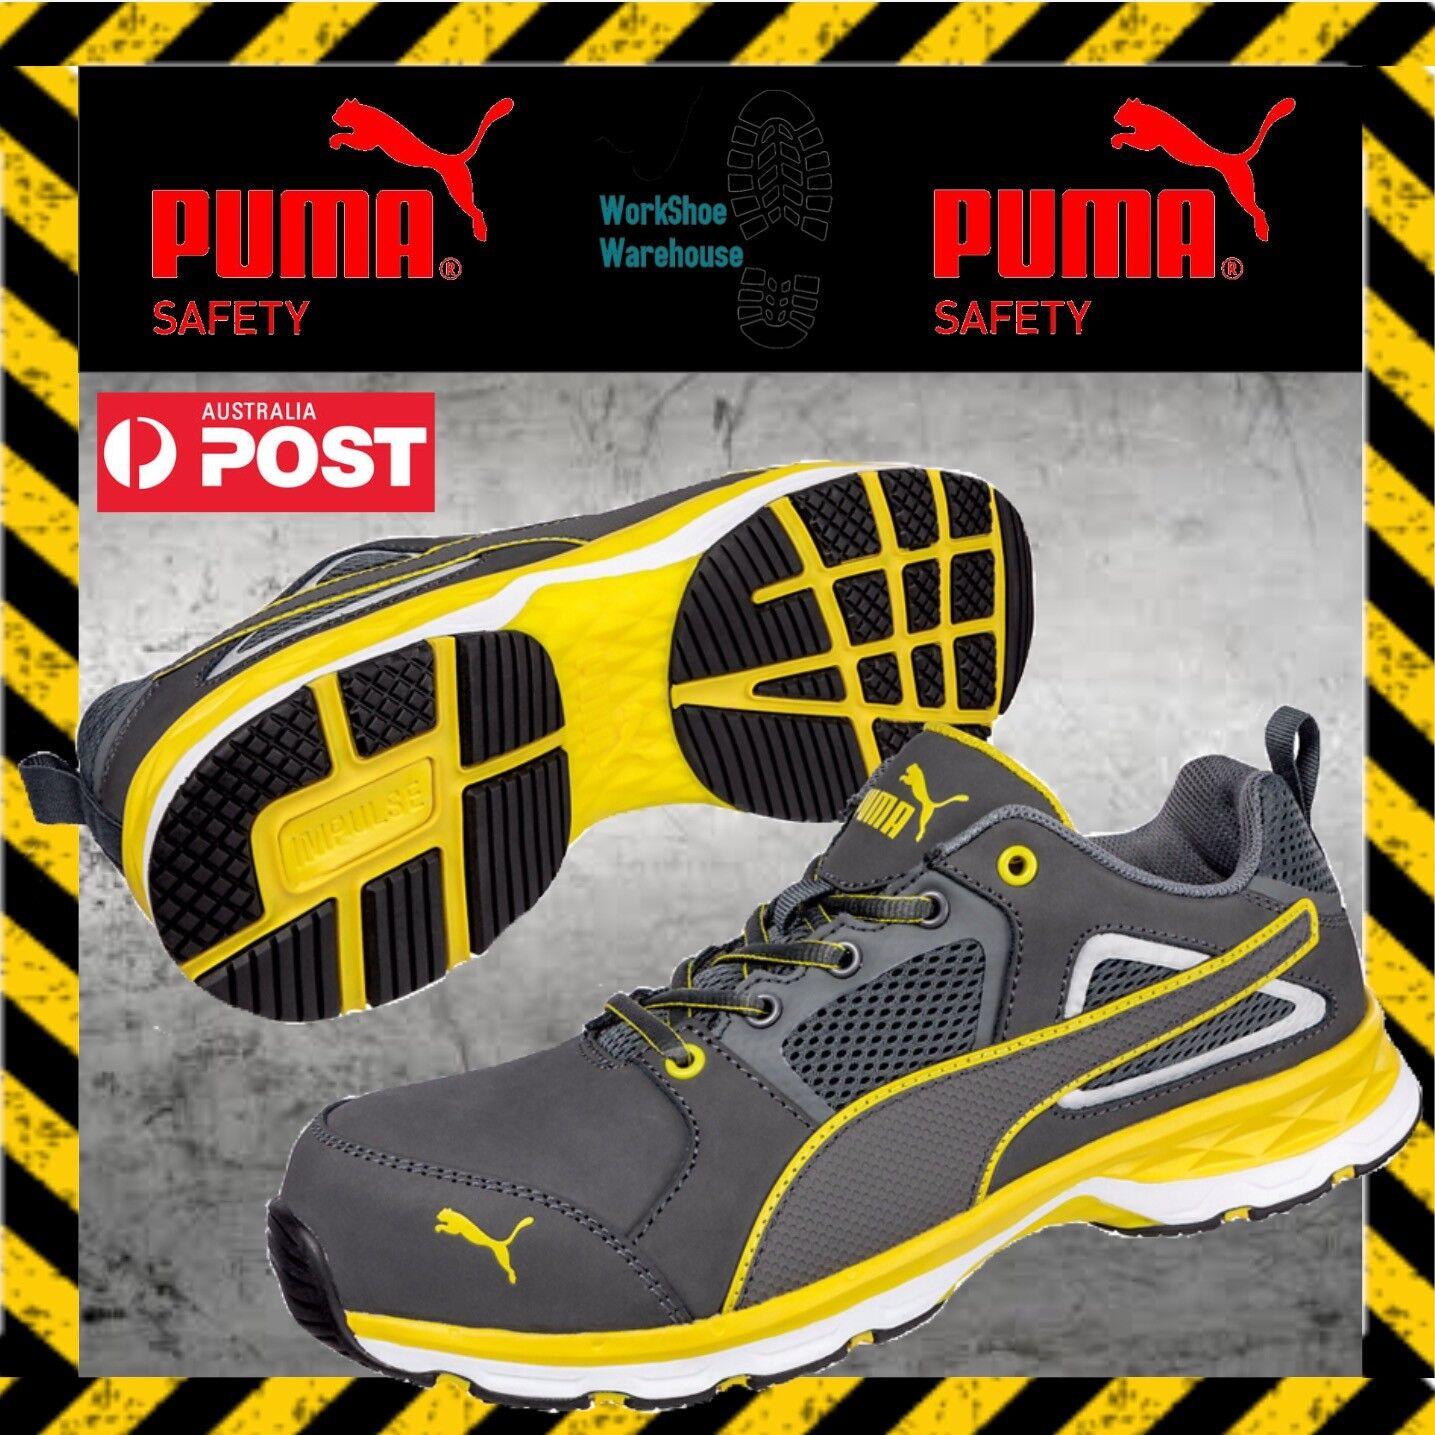 Puma Pace 2.0 643807 Composite Toe Cap Light Safety Work Jogger shoes